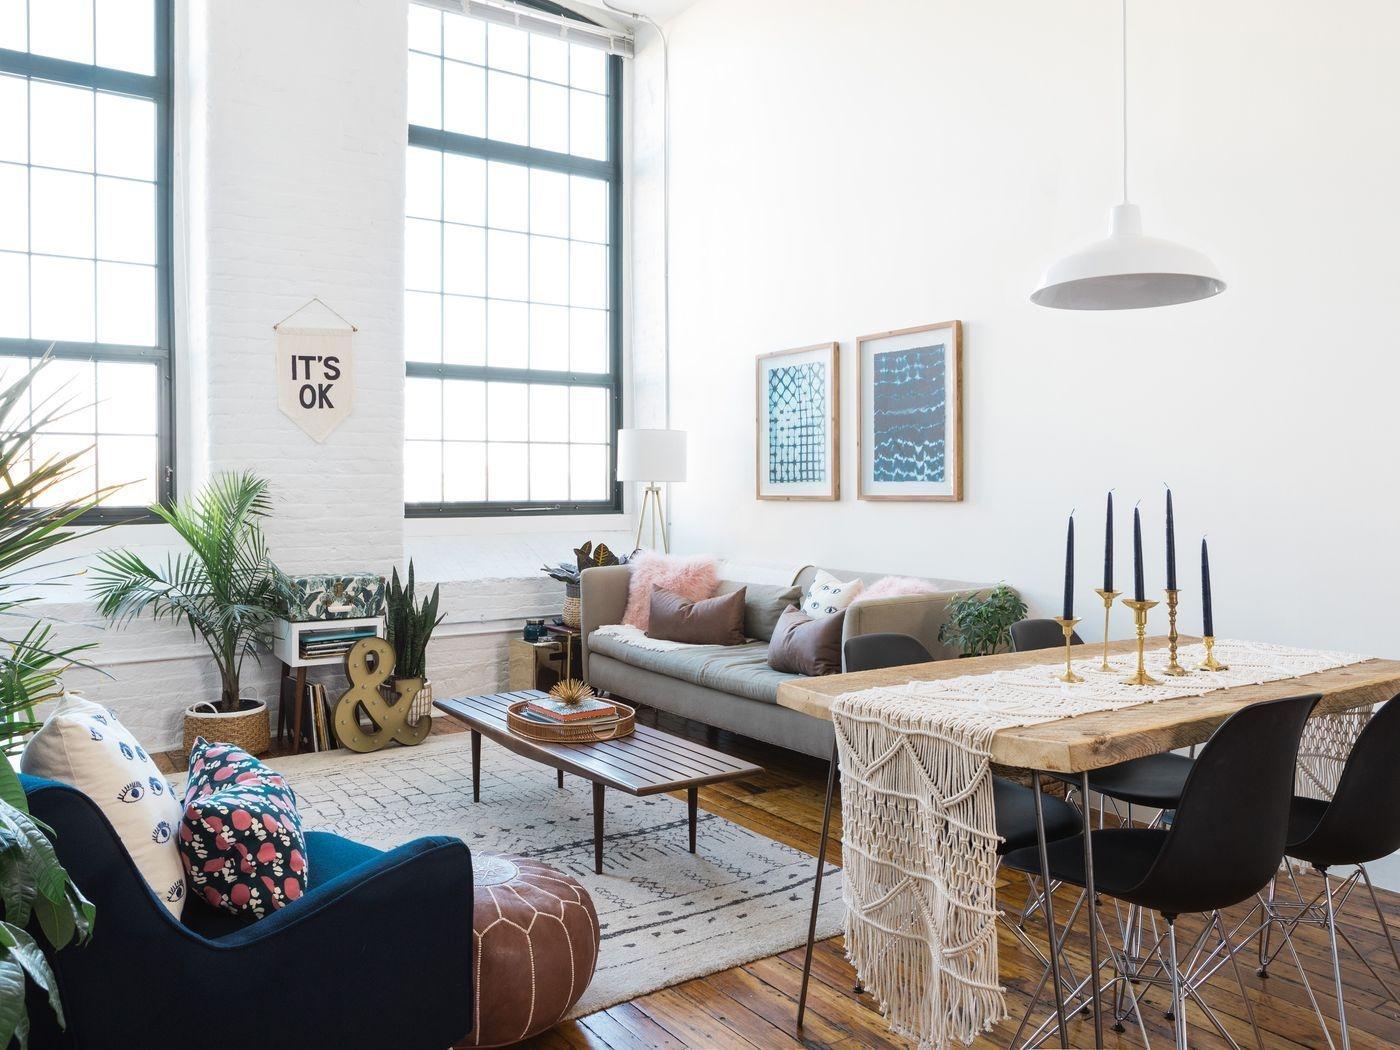 Astonishing Rental Apartment Decorating Ideas 01